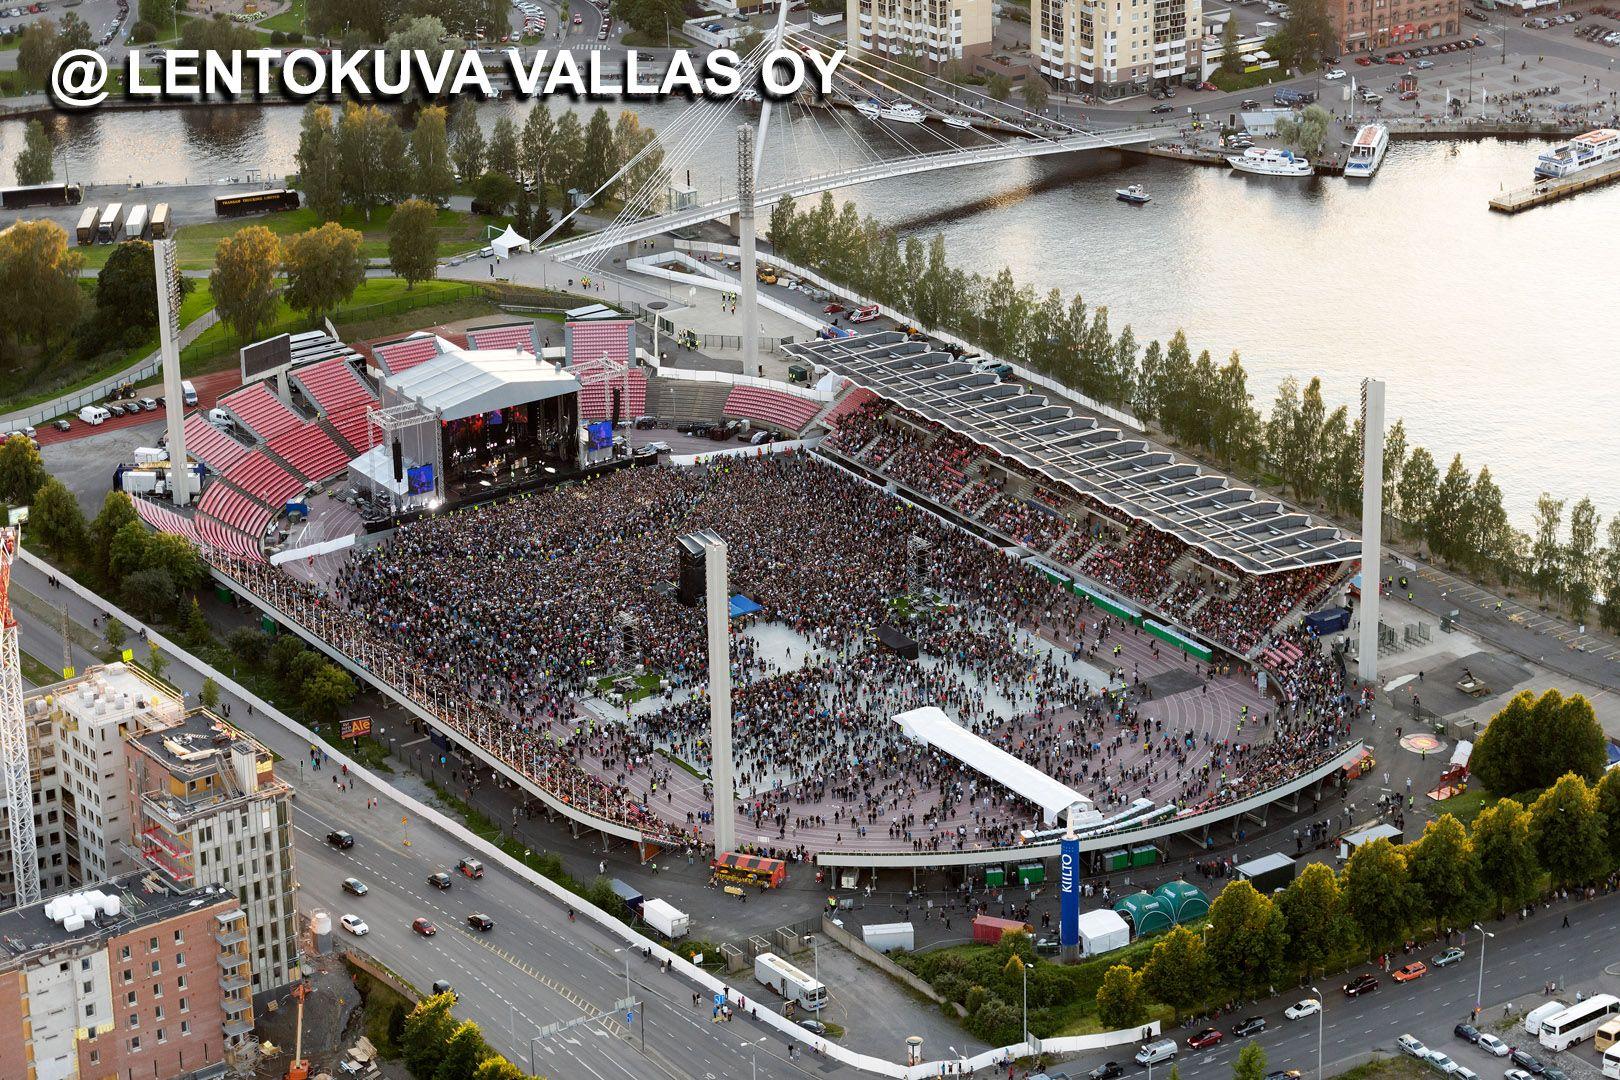 Tampere, Ratinan stadion, Red Hot Chili Peppers -konsertti, Ilmakuva: Lentokuva Vallas Oy ...